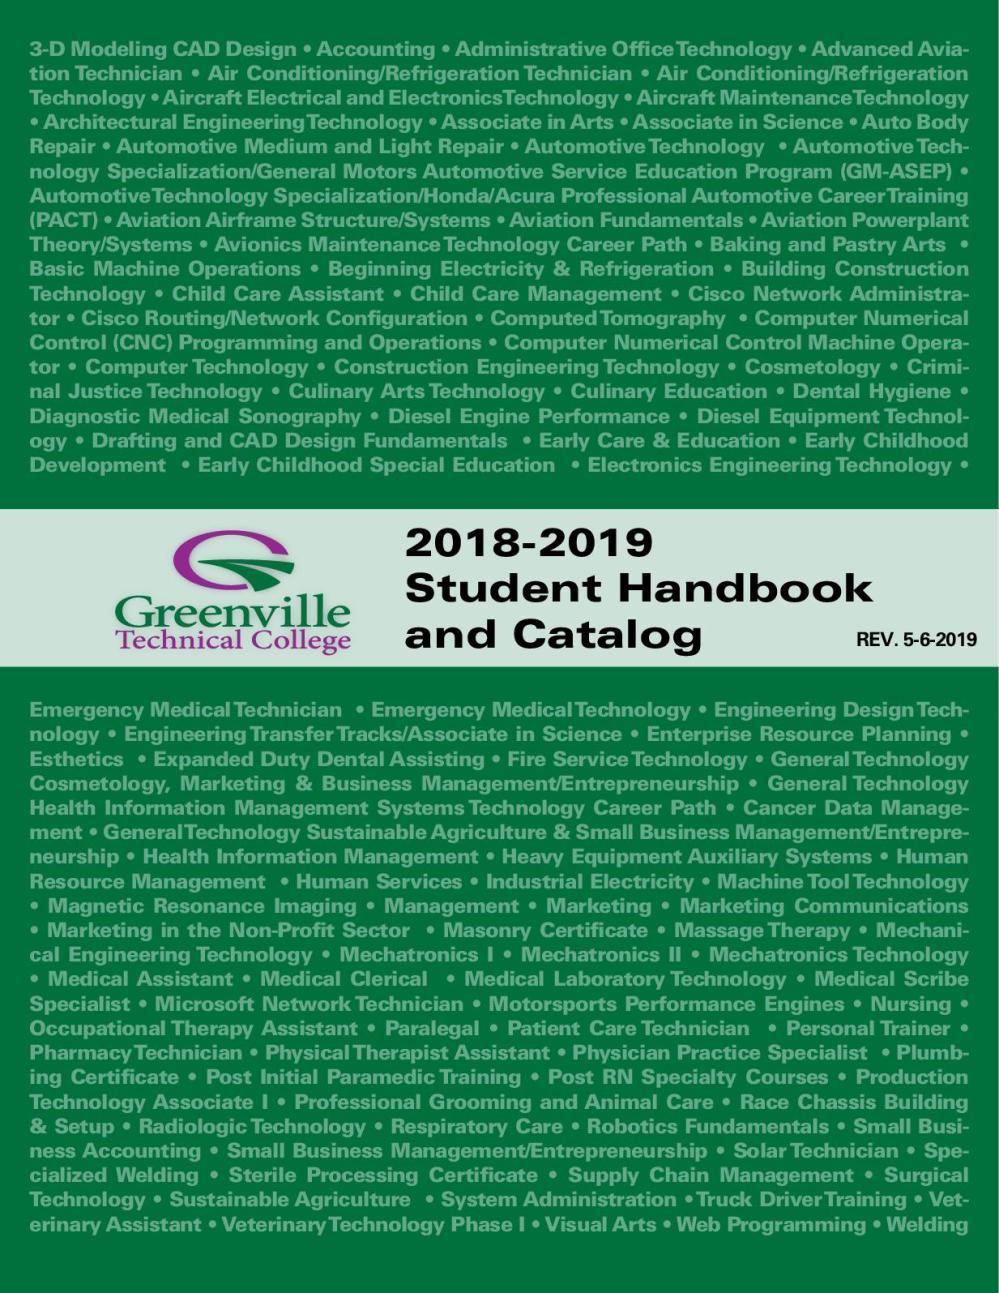 medium resolution of 2018 catalog and student handbook